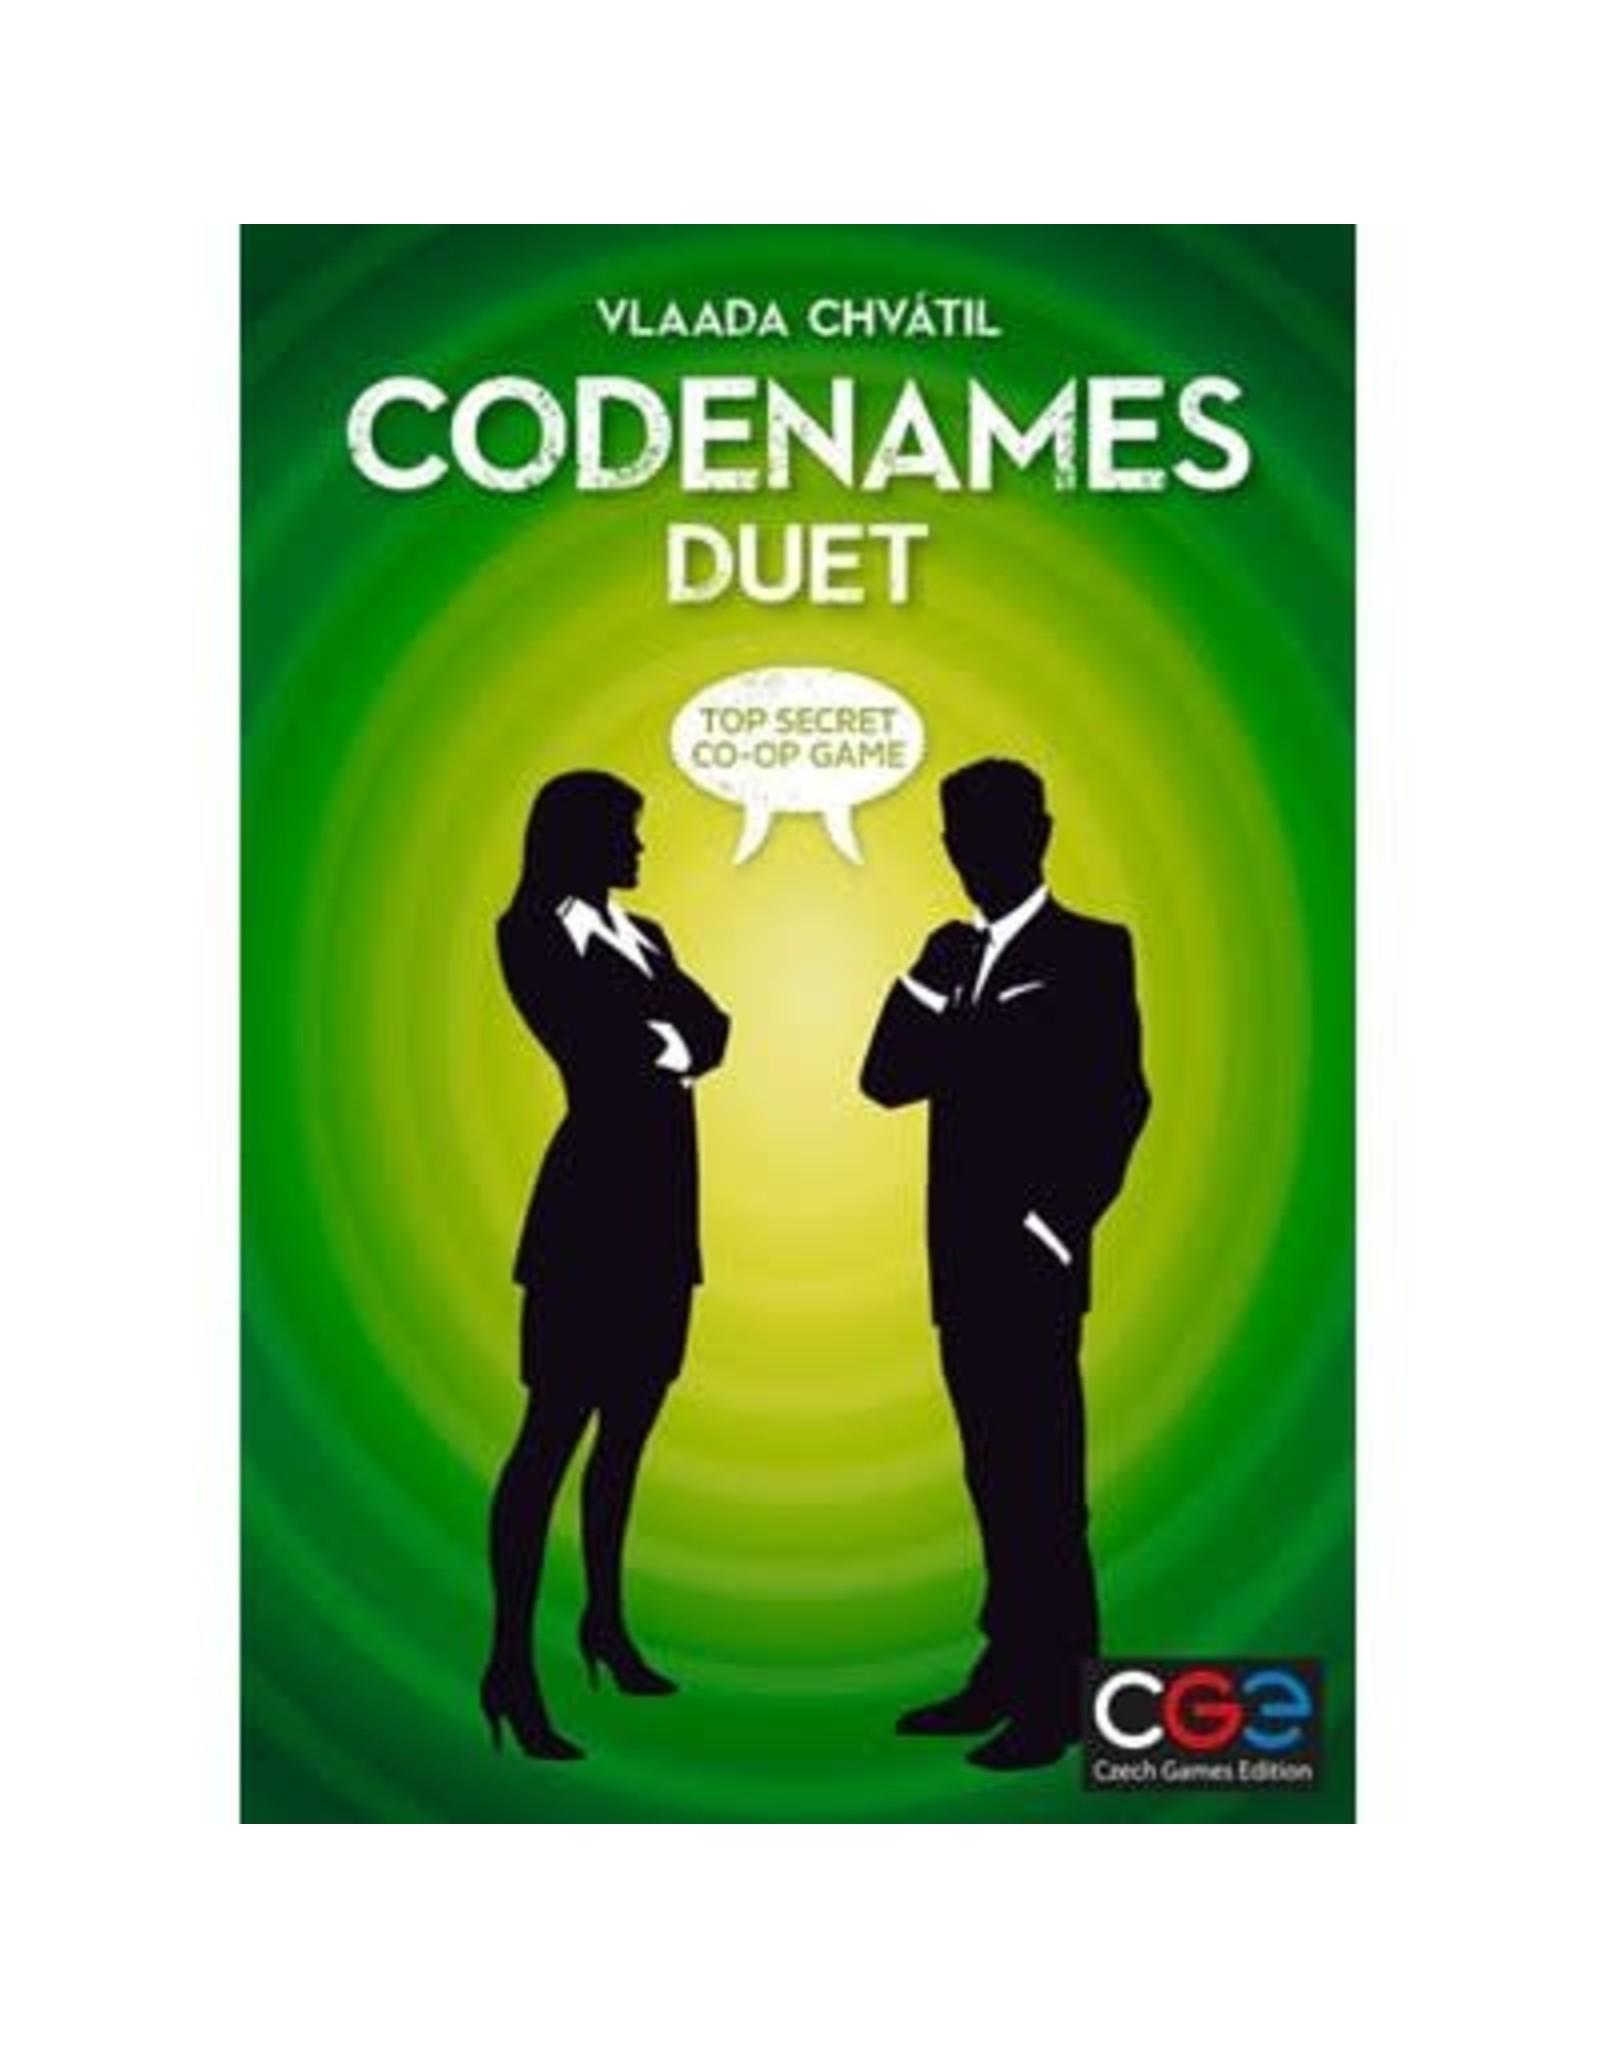 CGE Codenames Duet Game